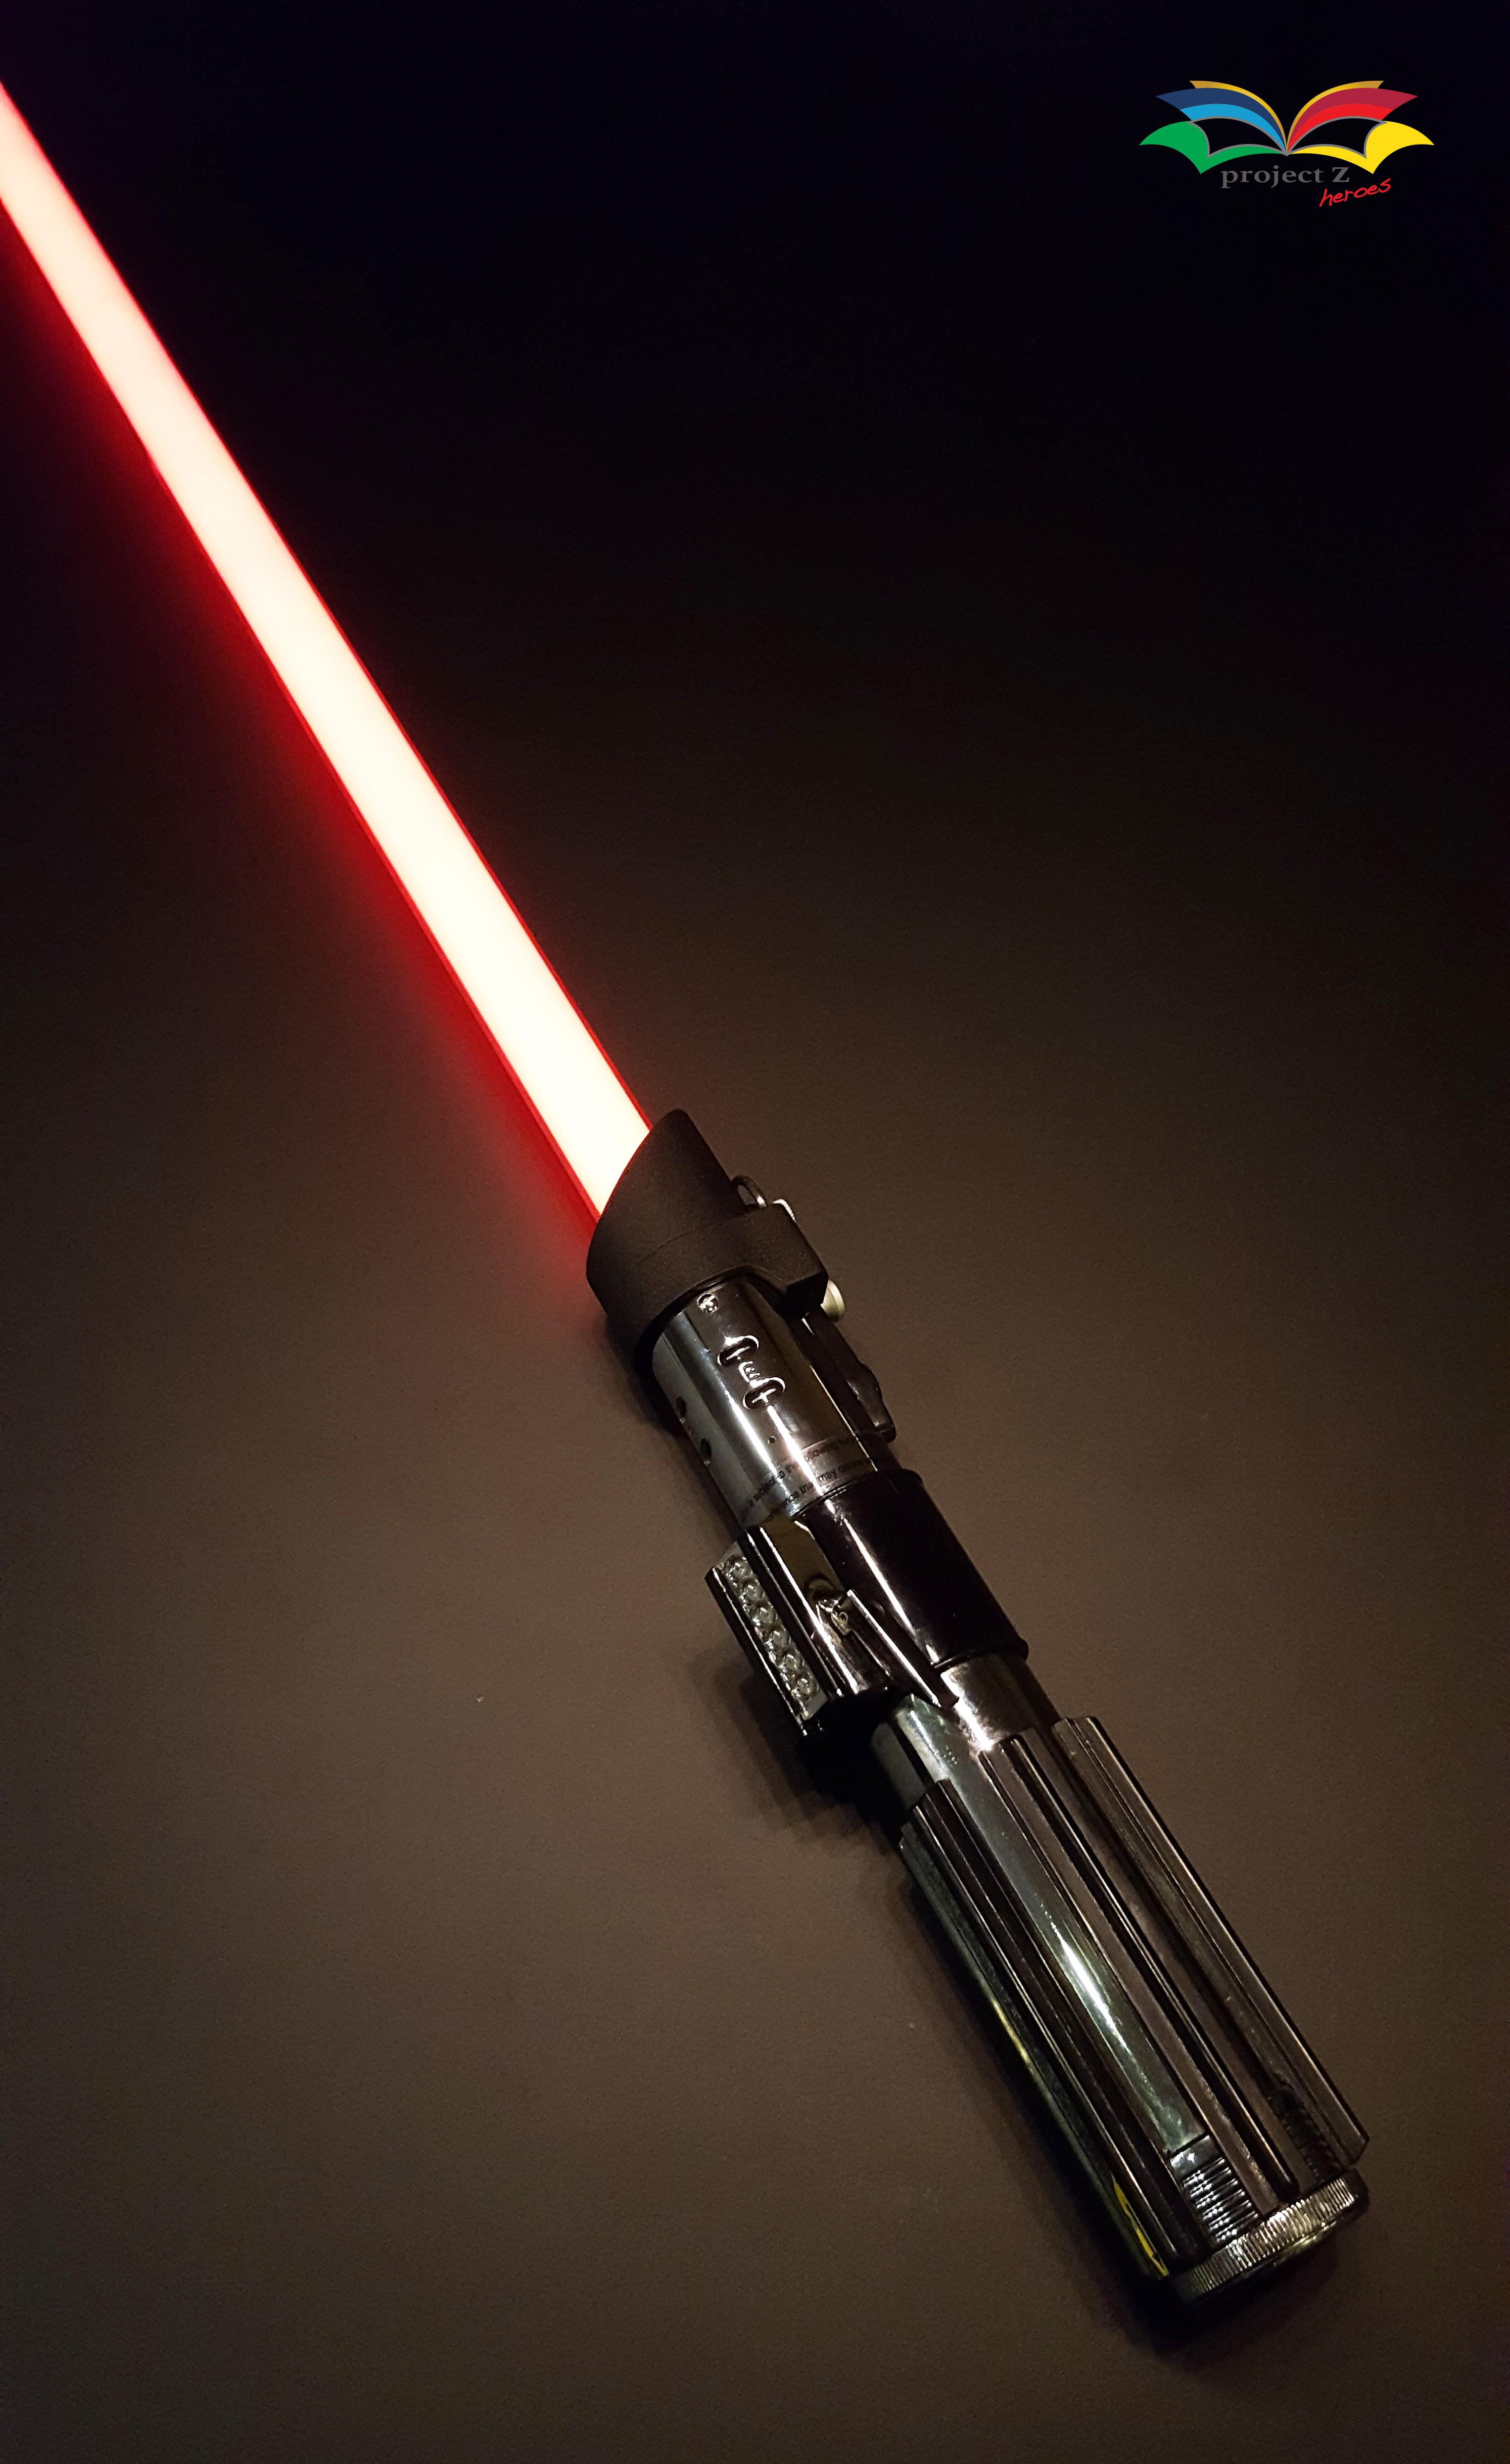 Darth Vader costume lightsaber